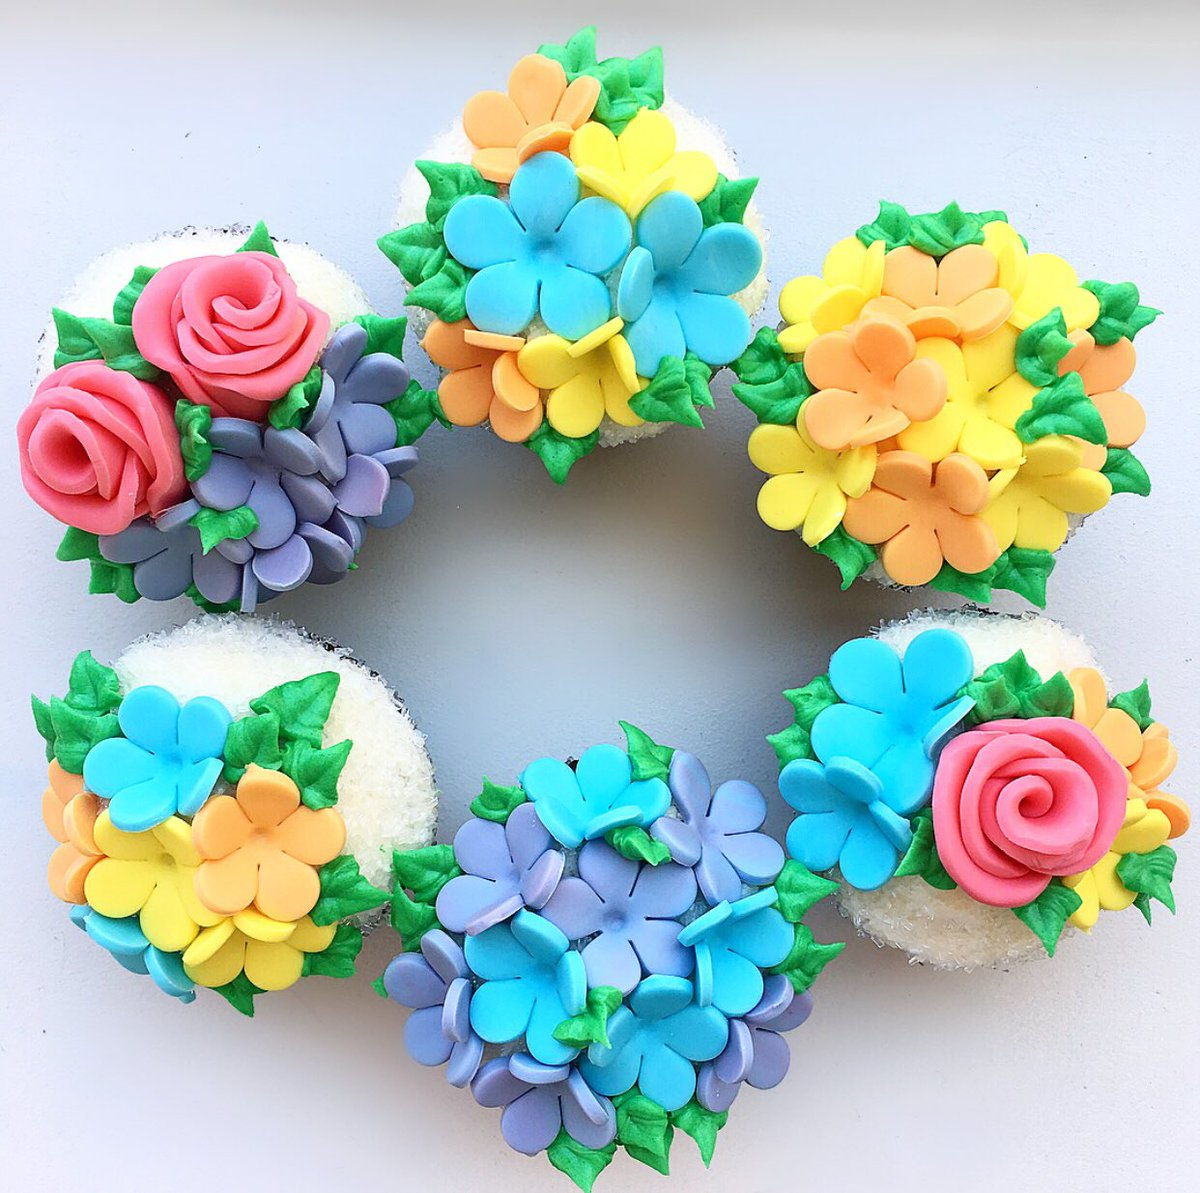 Duffs cakemix on twitter tag the person who deserves this bouquet duffscakemix diy cakedecorating cupcakes flowers pretty yummy fun beautiful buttercream fondant cakesofinstagram cakeart izmirmasajfo